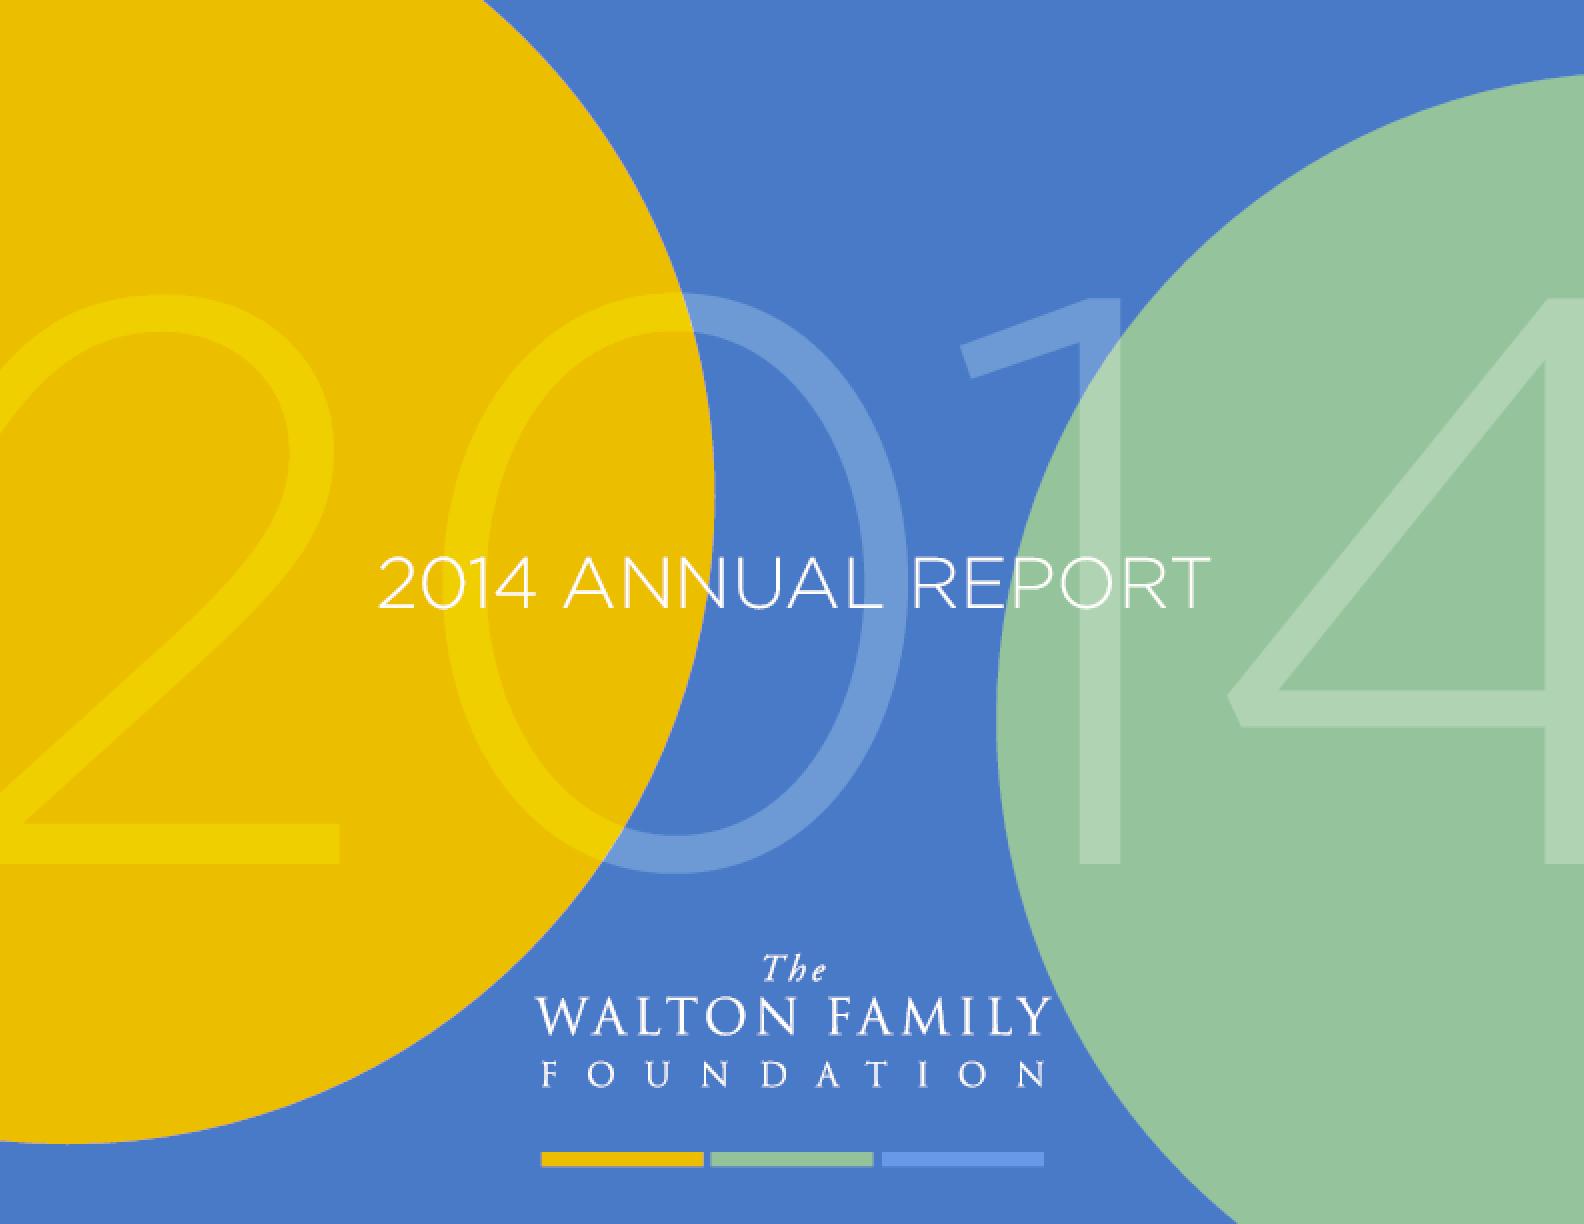 2014 Annual Report: The Walton Family Foundation